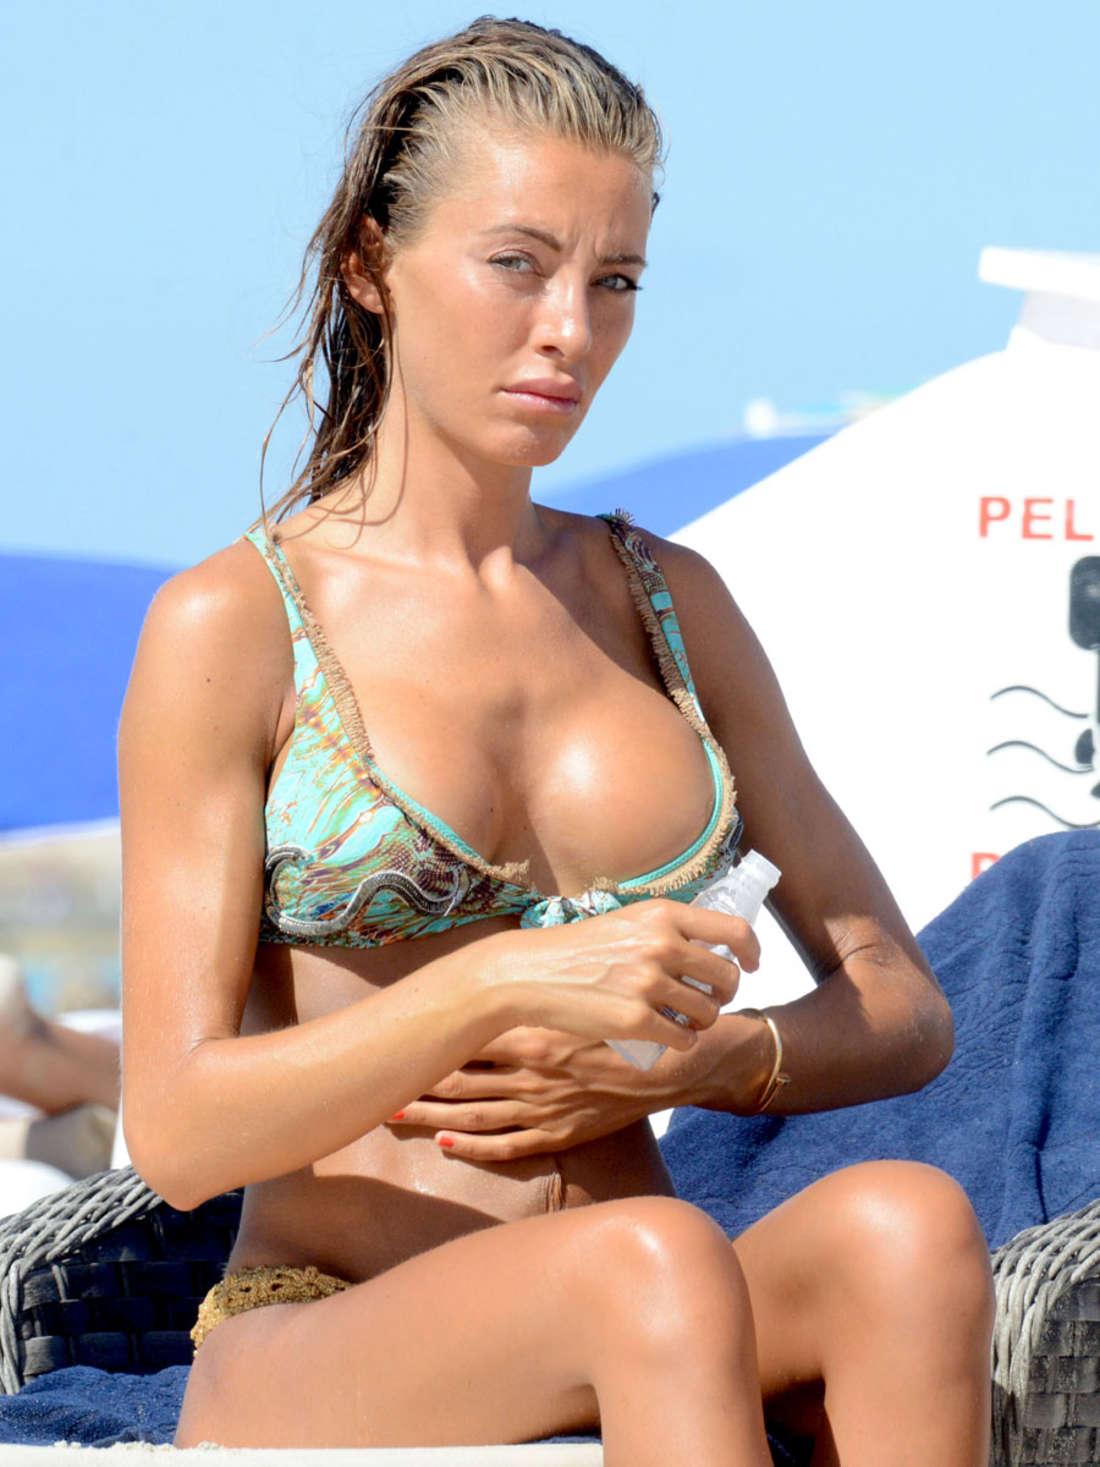 Alessia Tedeschi Pink Swimsuit Photos: 2014 in Miami -02